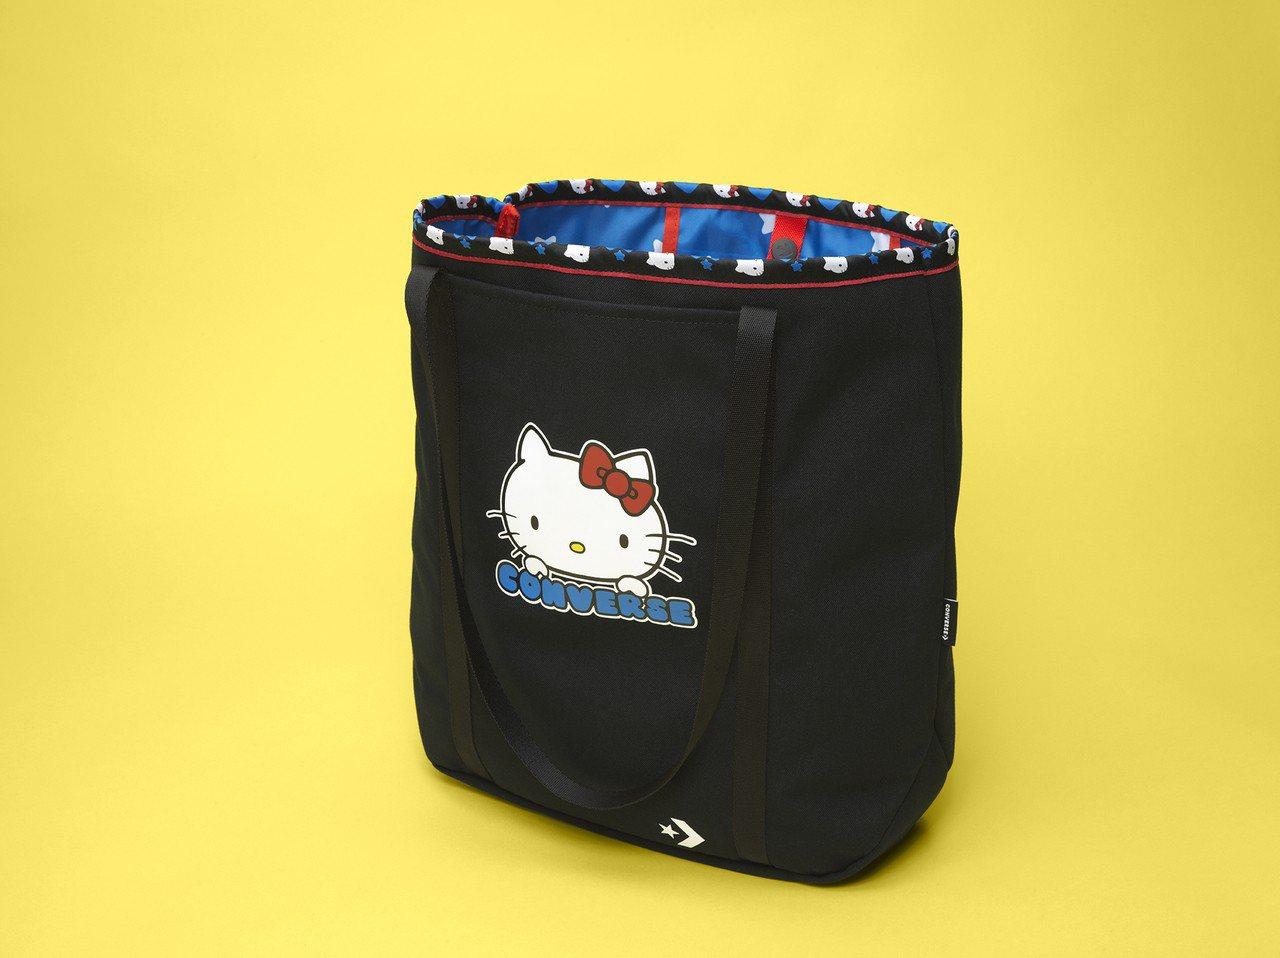 Converse與Hello Kitty聯名系列休閒提袋,1,580元。圖/Co...